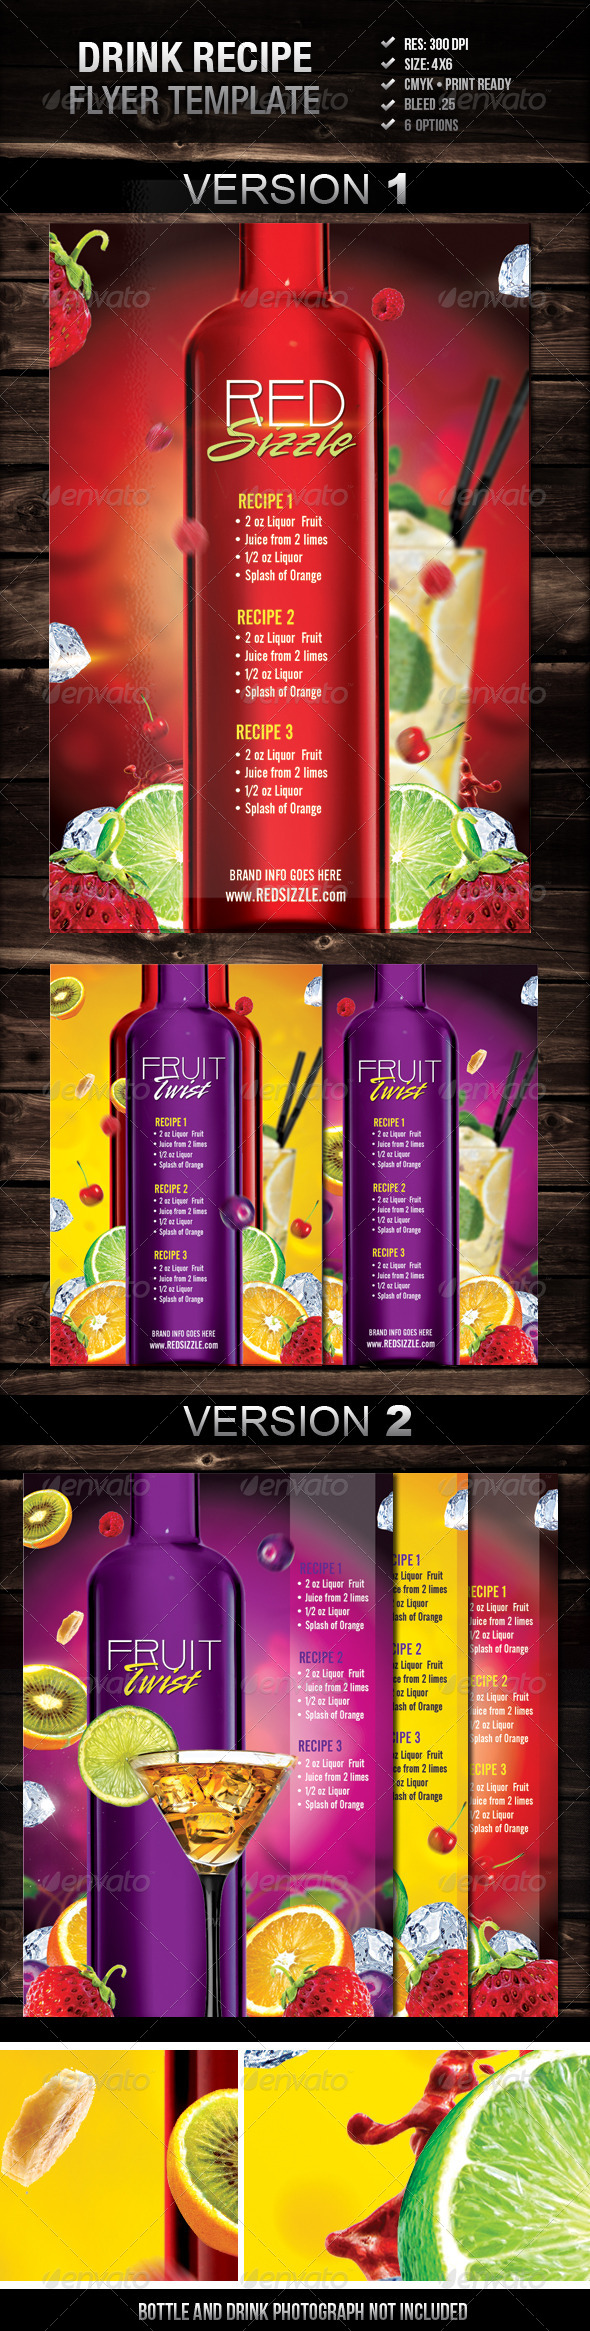 Fruit Twist Recipe Flyer - Restaurant Flyers